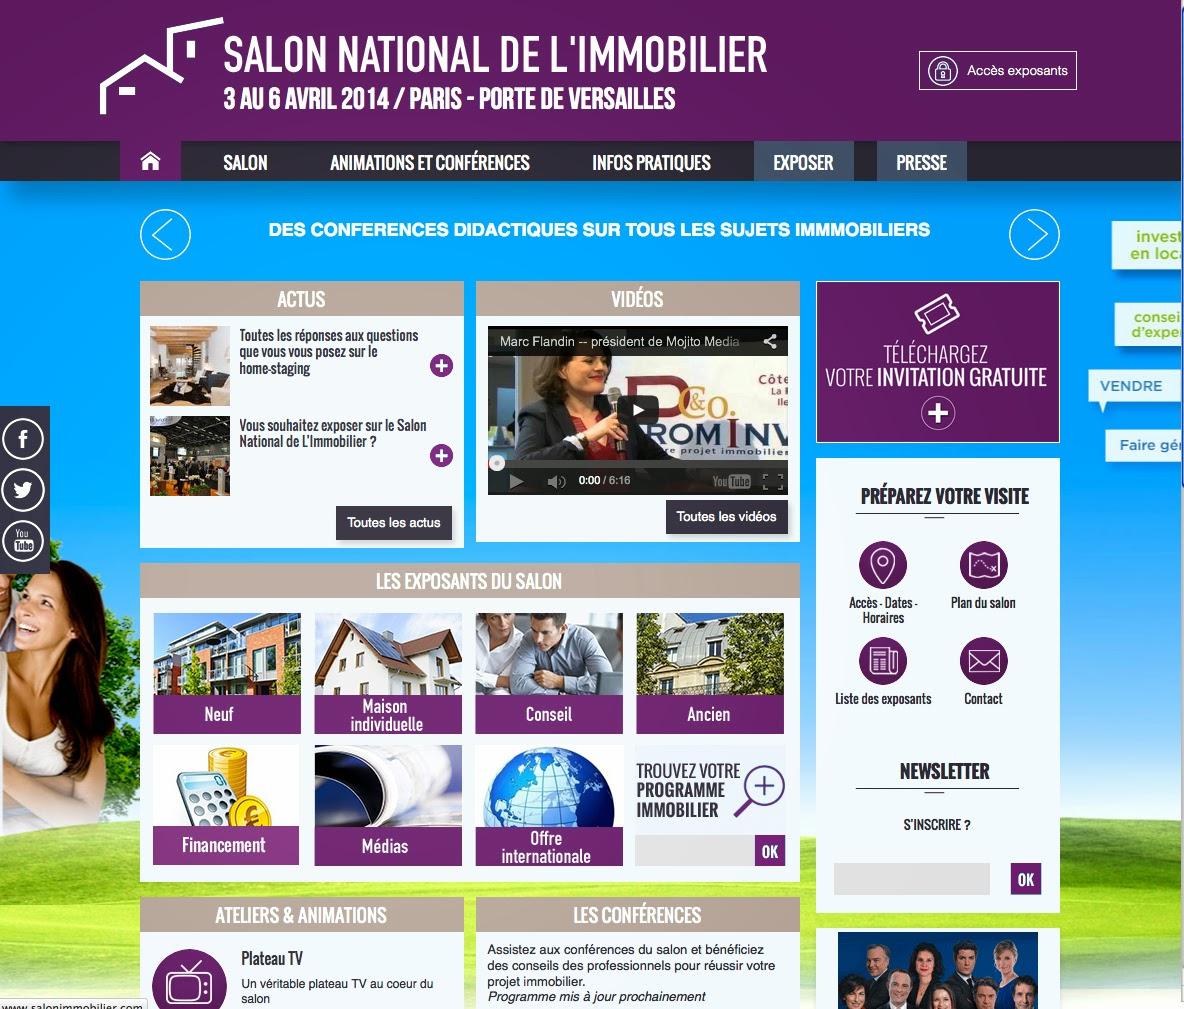 http://www.salonimmobilier.com/